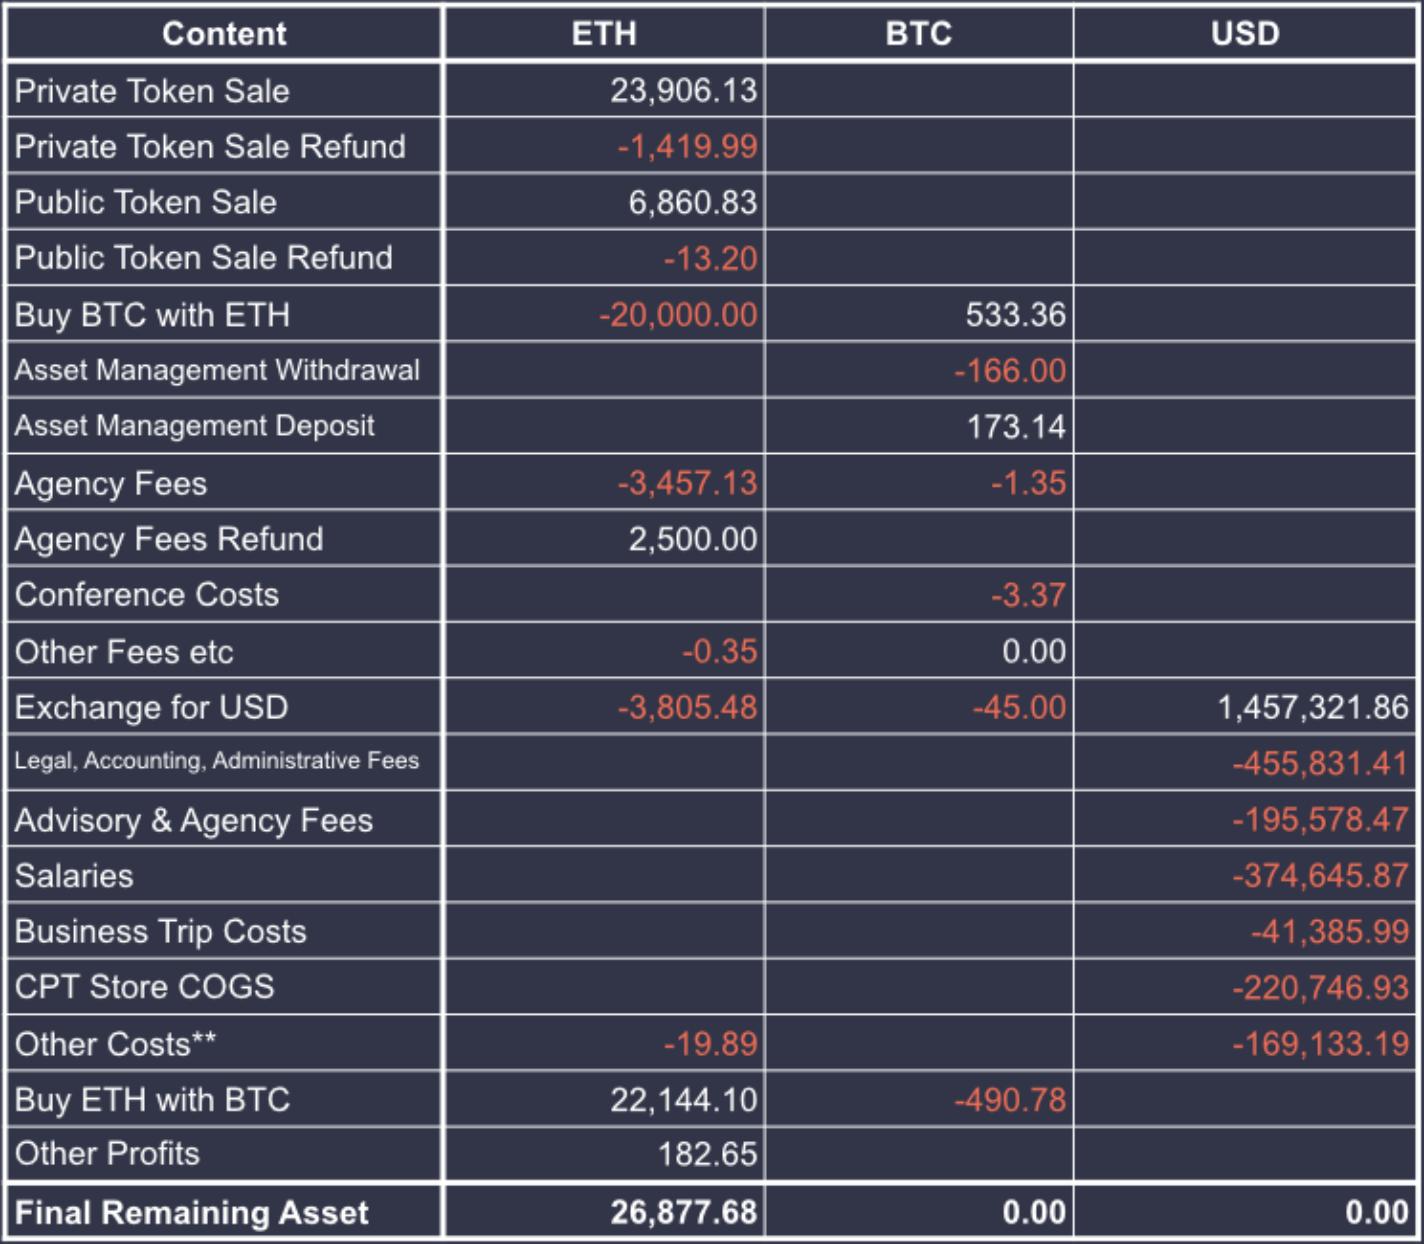 Contents Protocol balance sheet